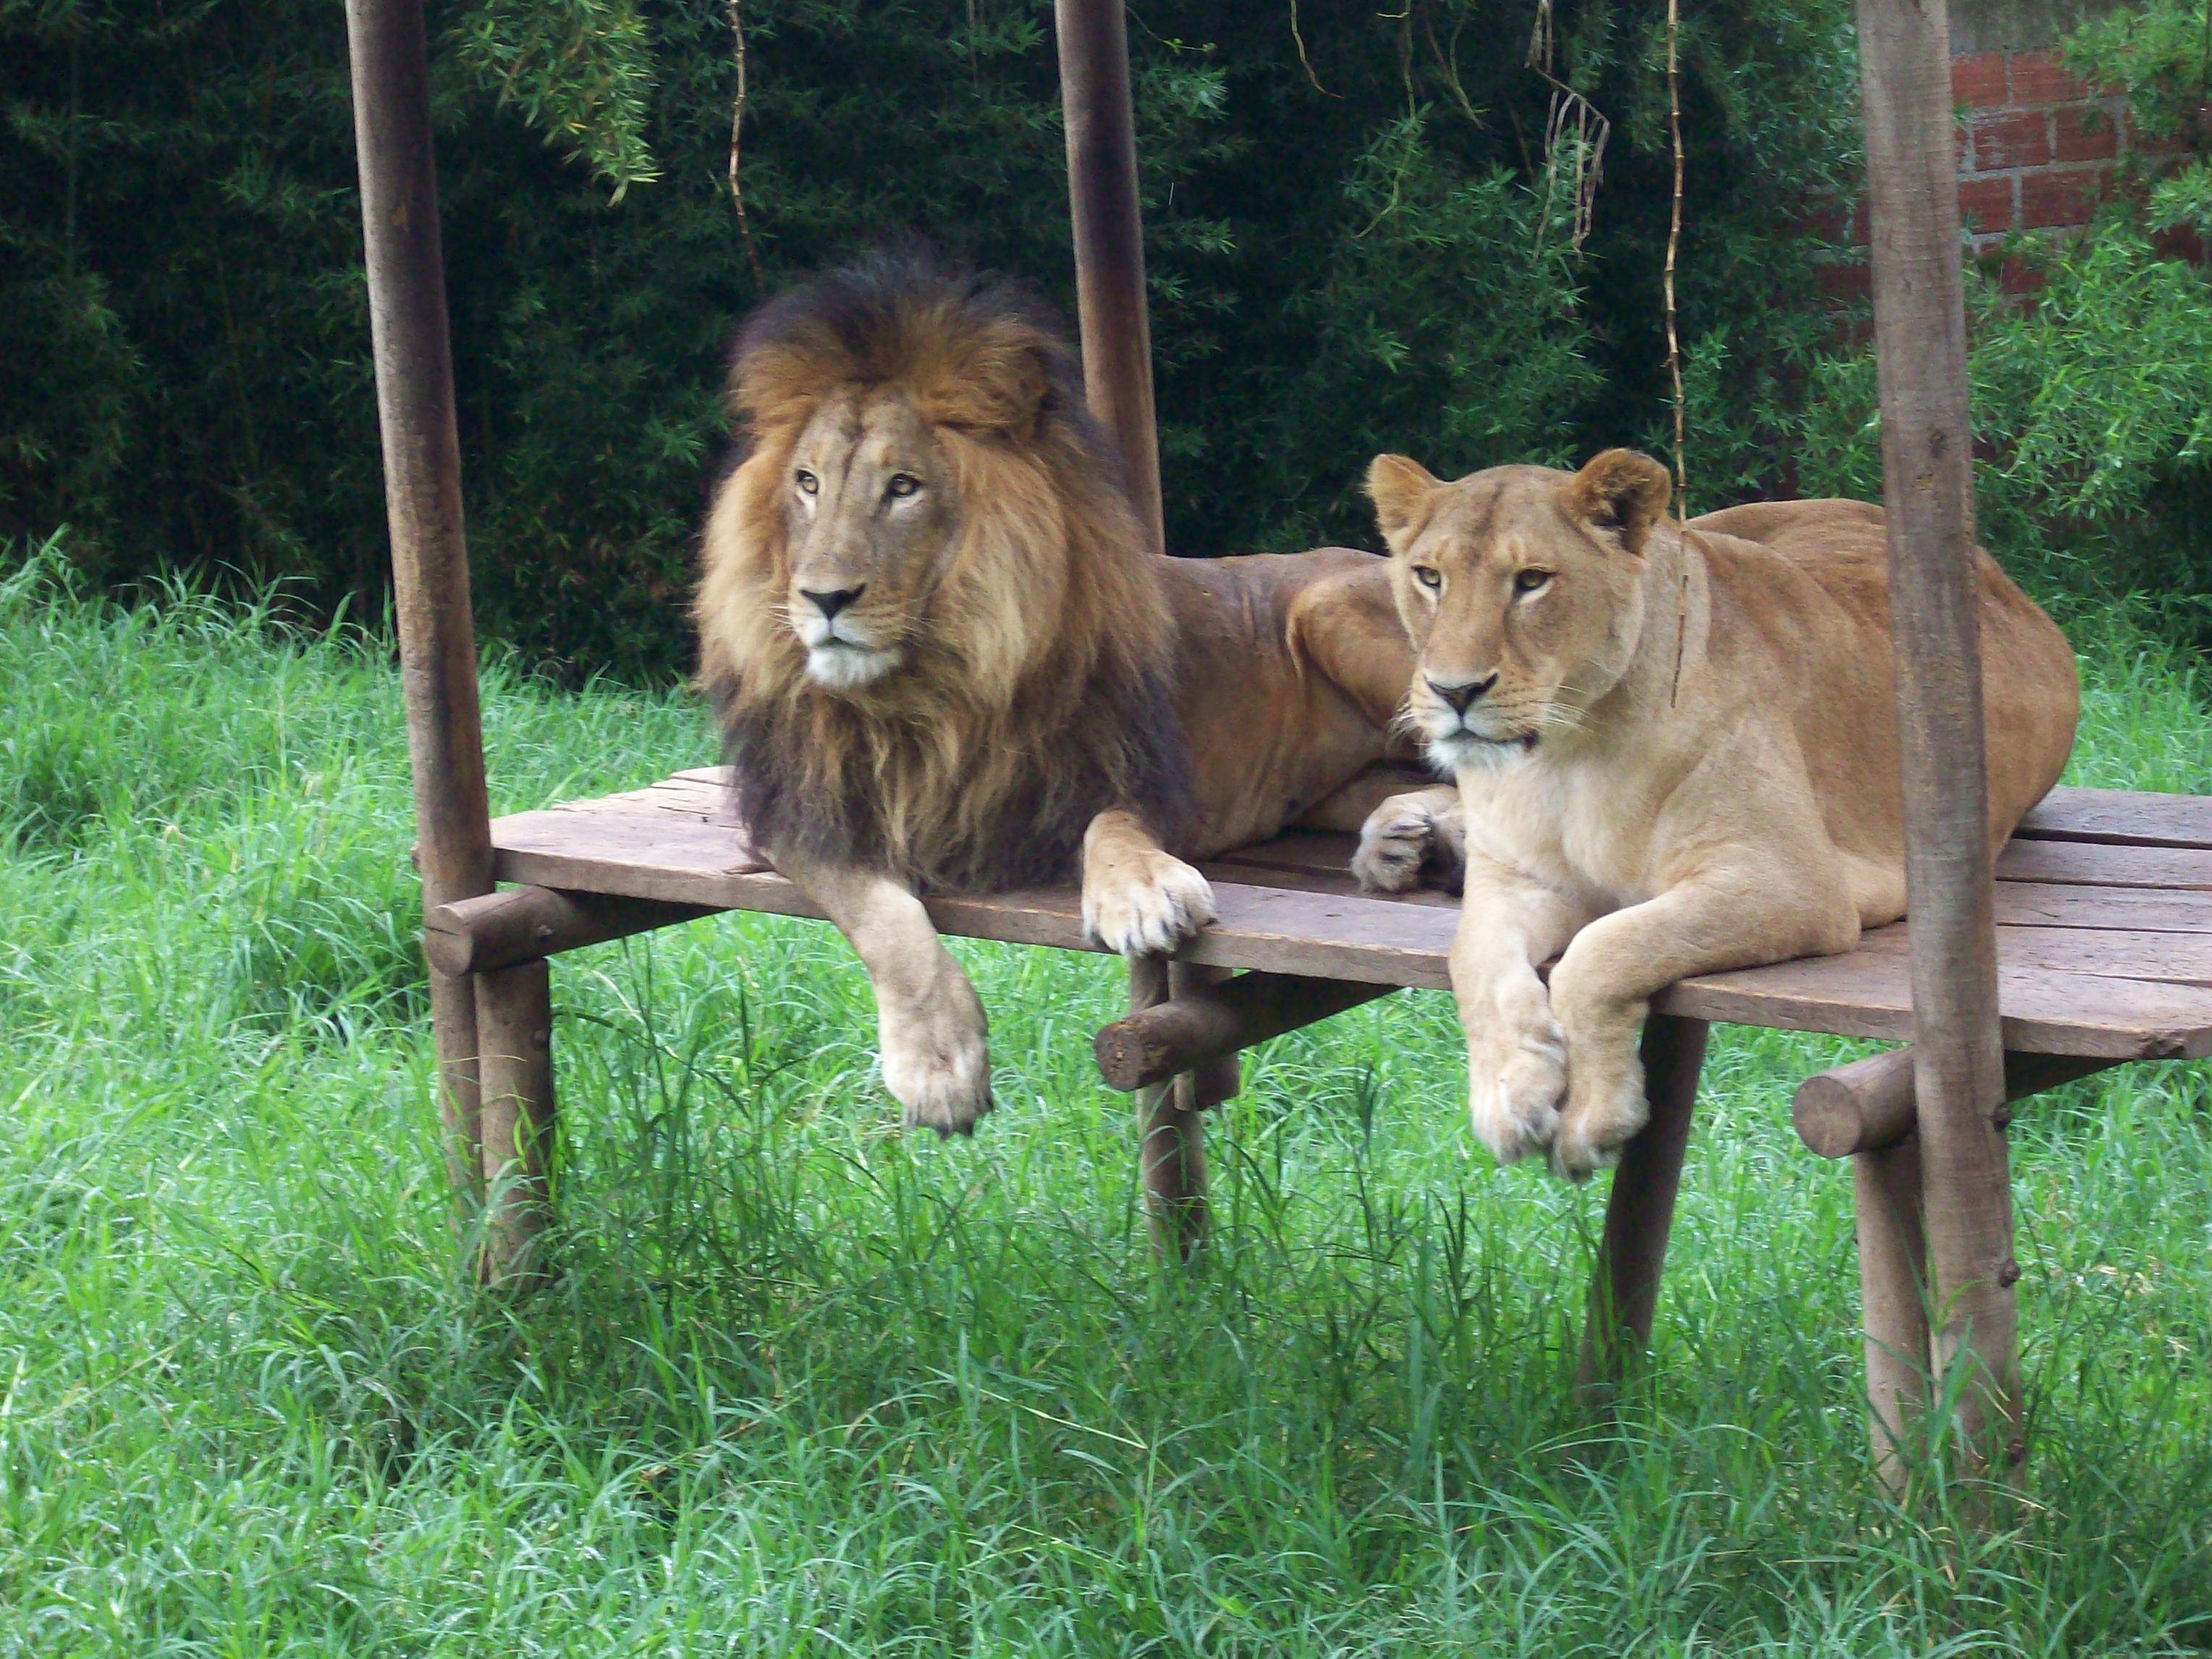 AZCARM OBTIENE DONATIVOS PARA ALIMENTAR ANIMALES SILVESTRES